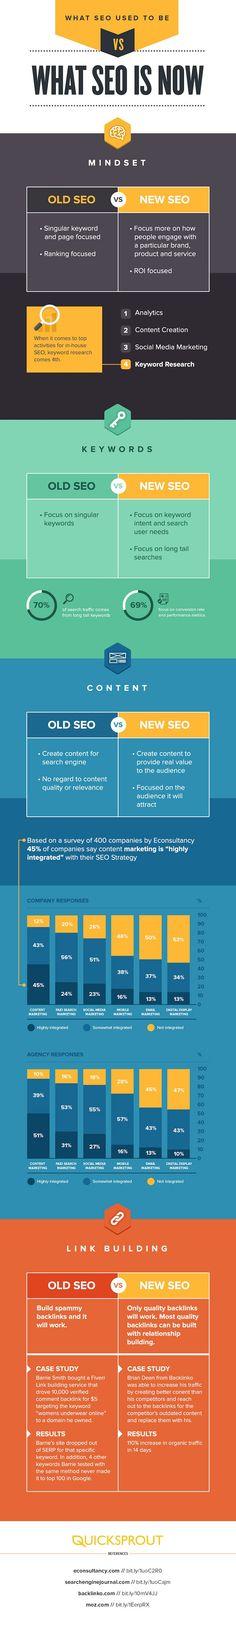 #SEO #marketing #infographic #websites